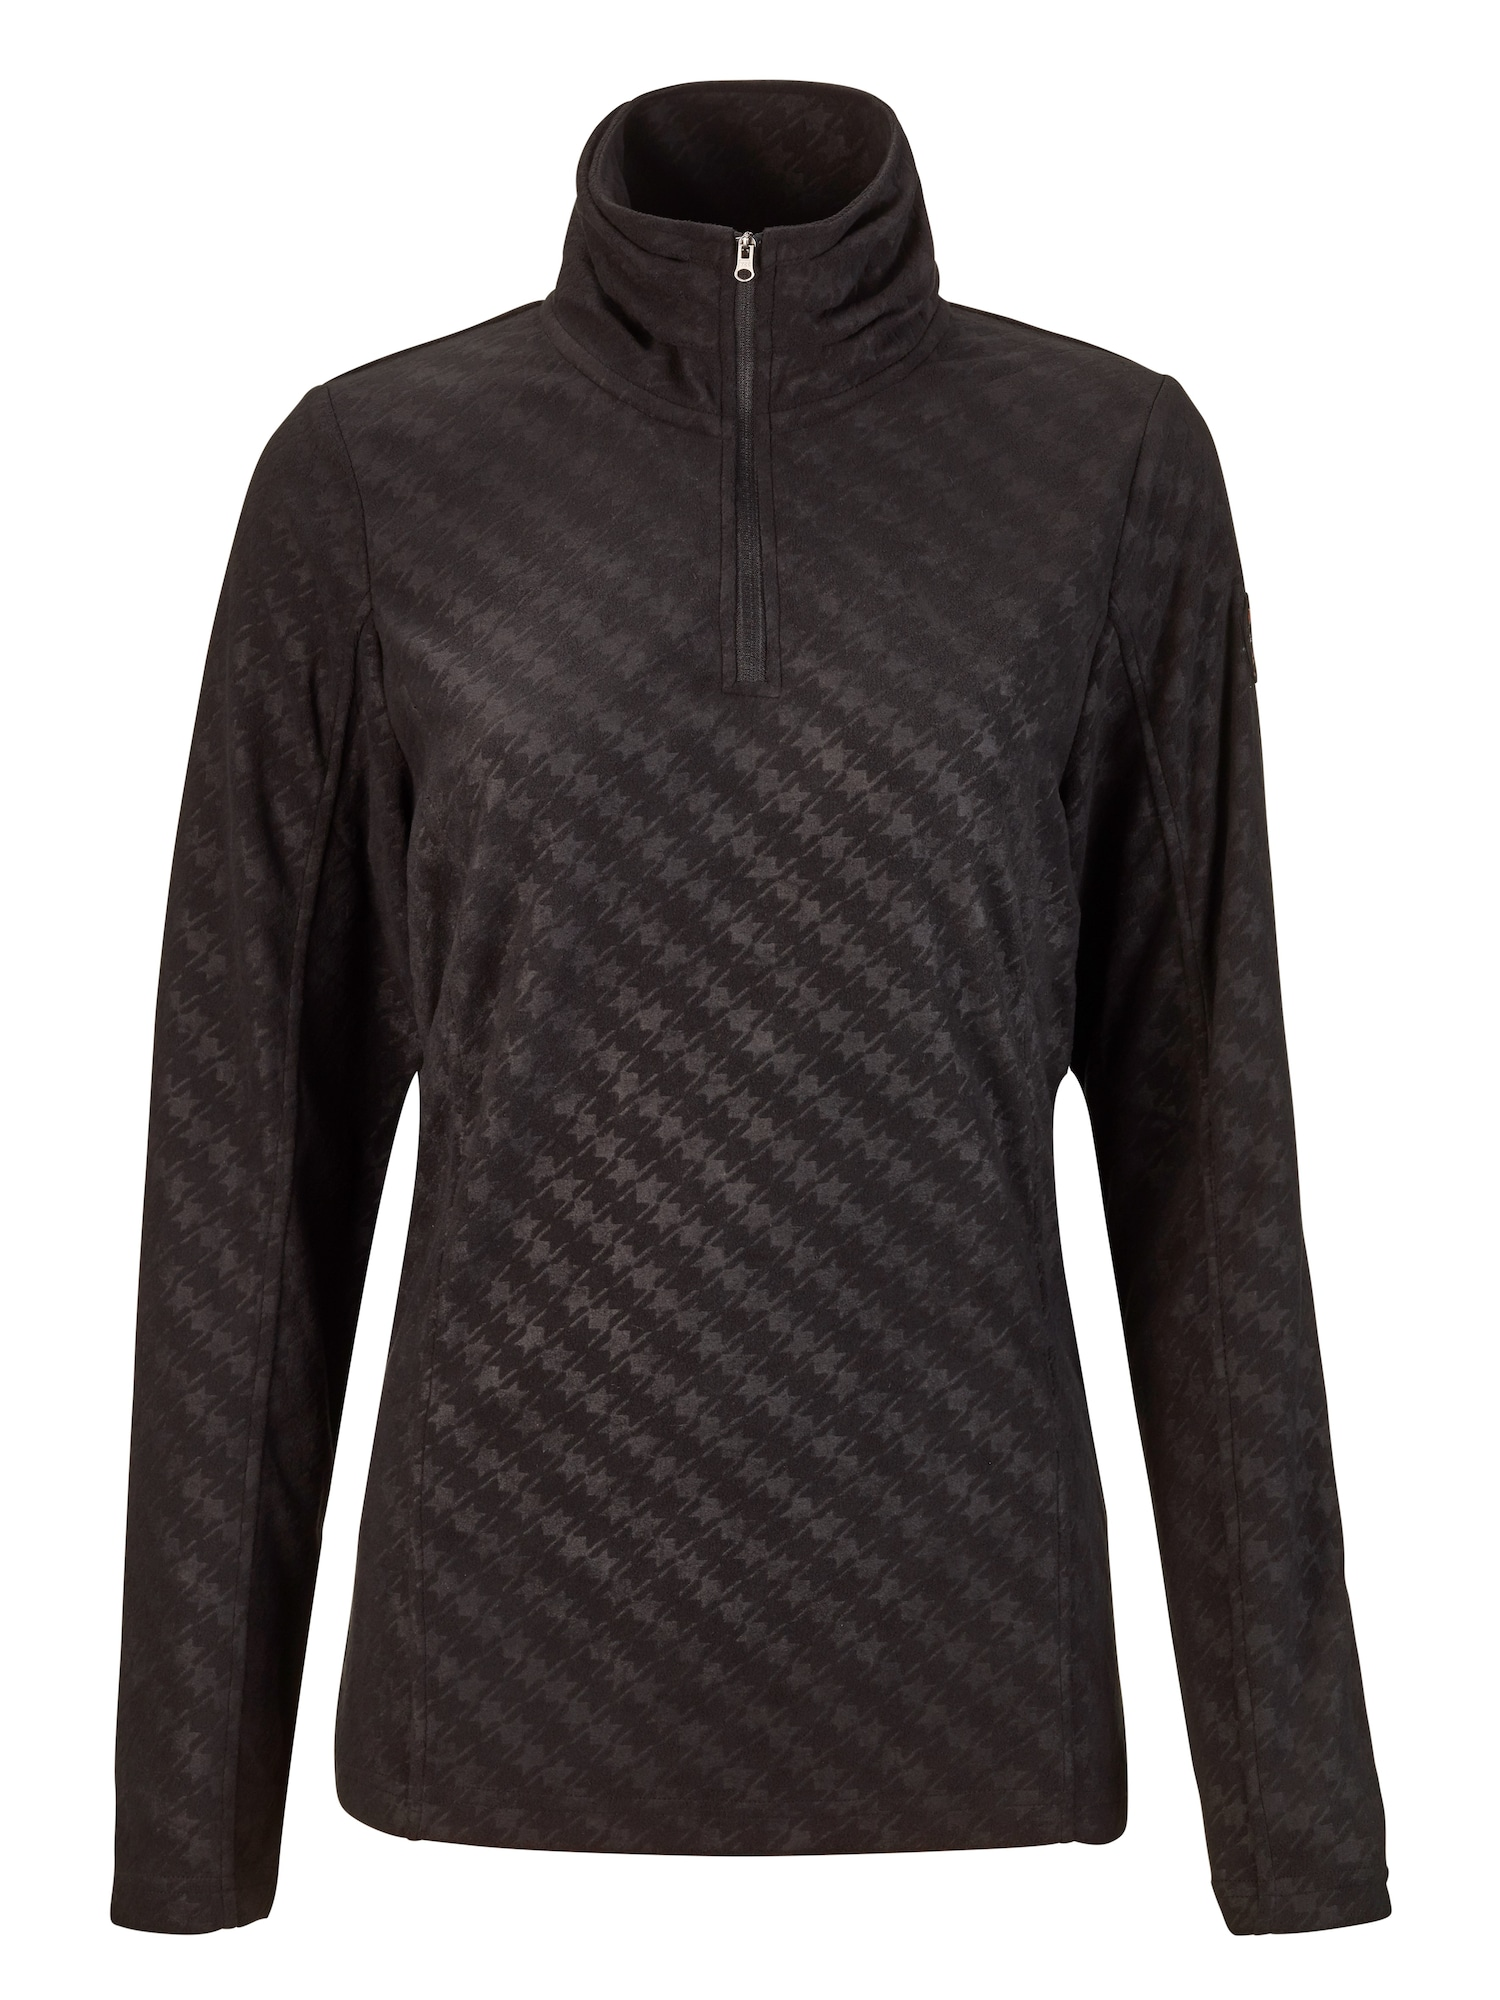 Funkční tričko Gunda černá KILLTEC